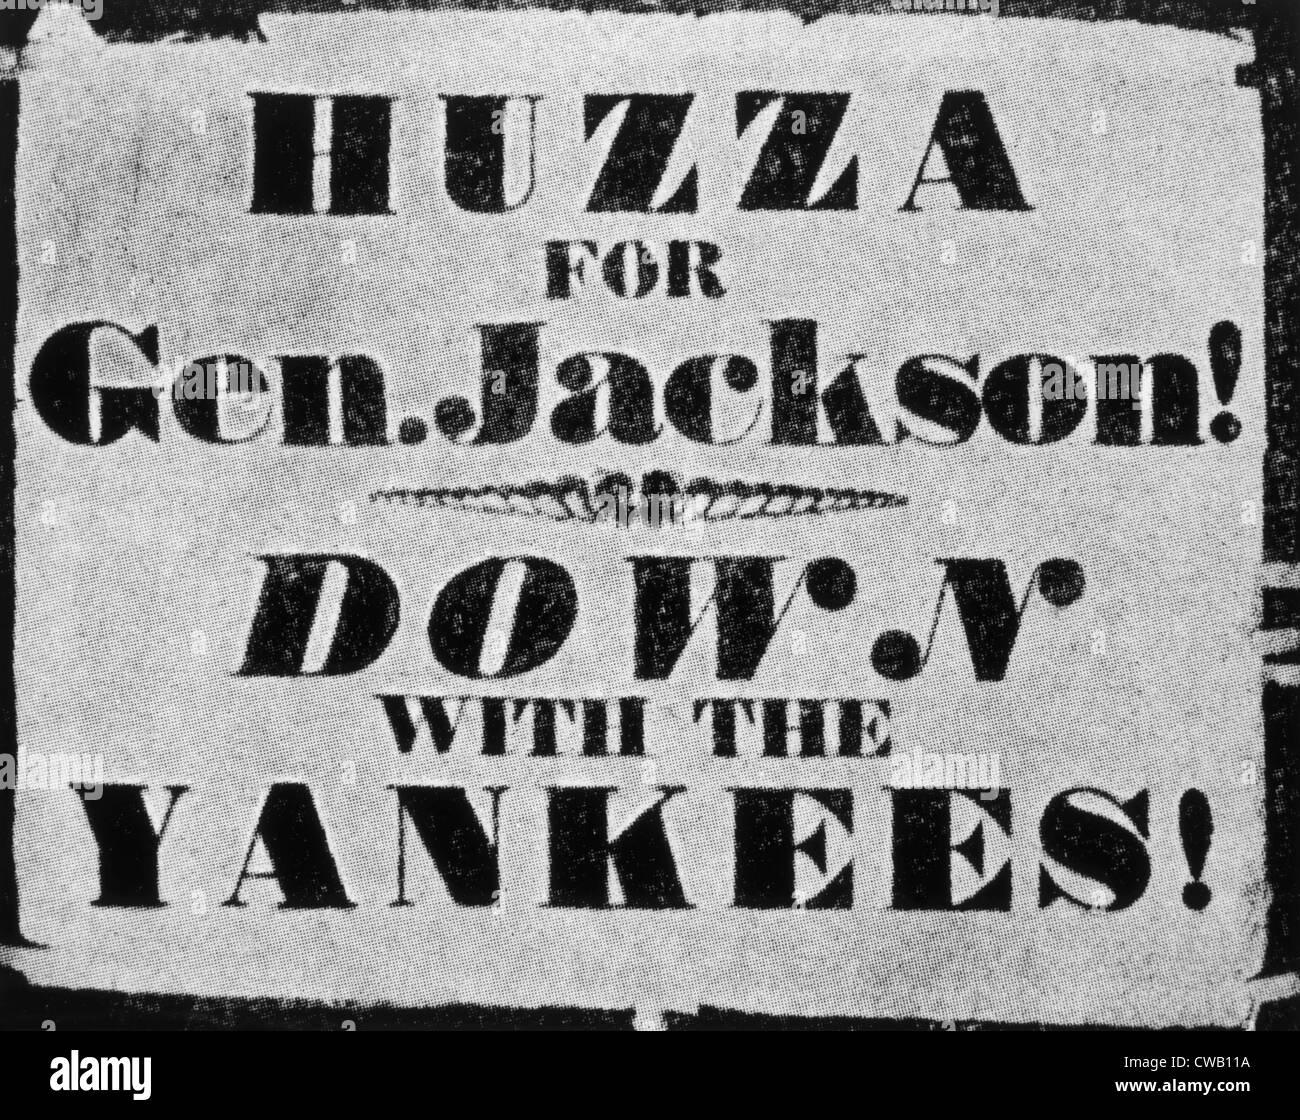 Andrew Jackson campagna presidenziale poster, 1828 Immagini Stock